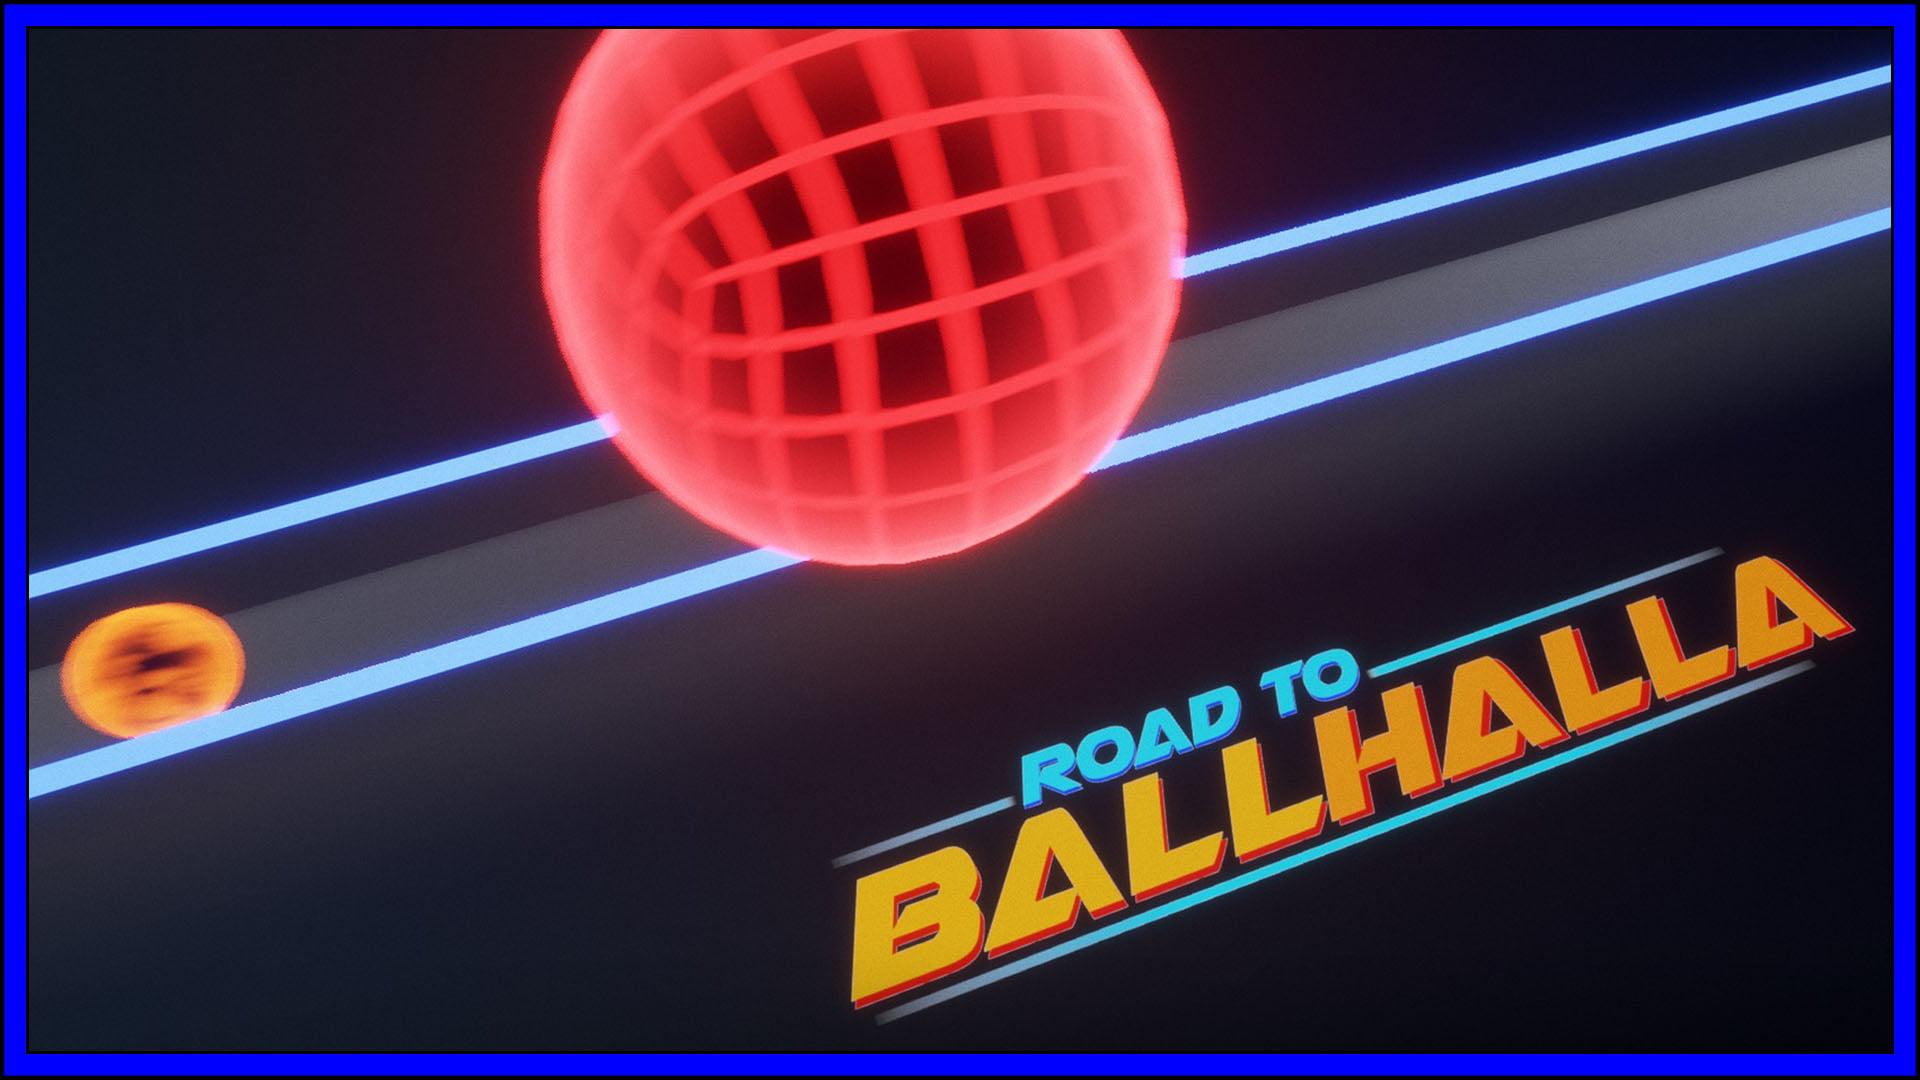 Road To Ballhalla Fi3